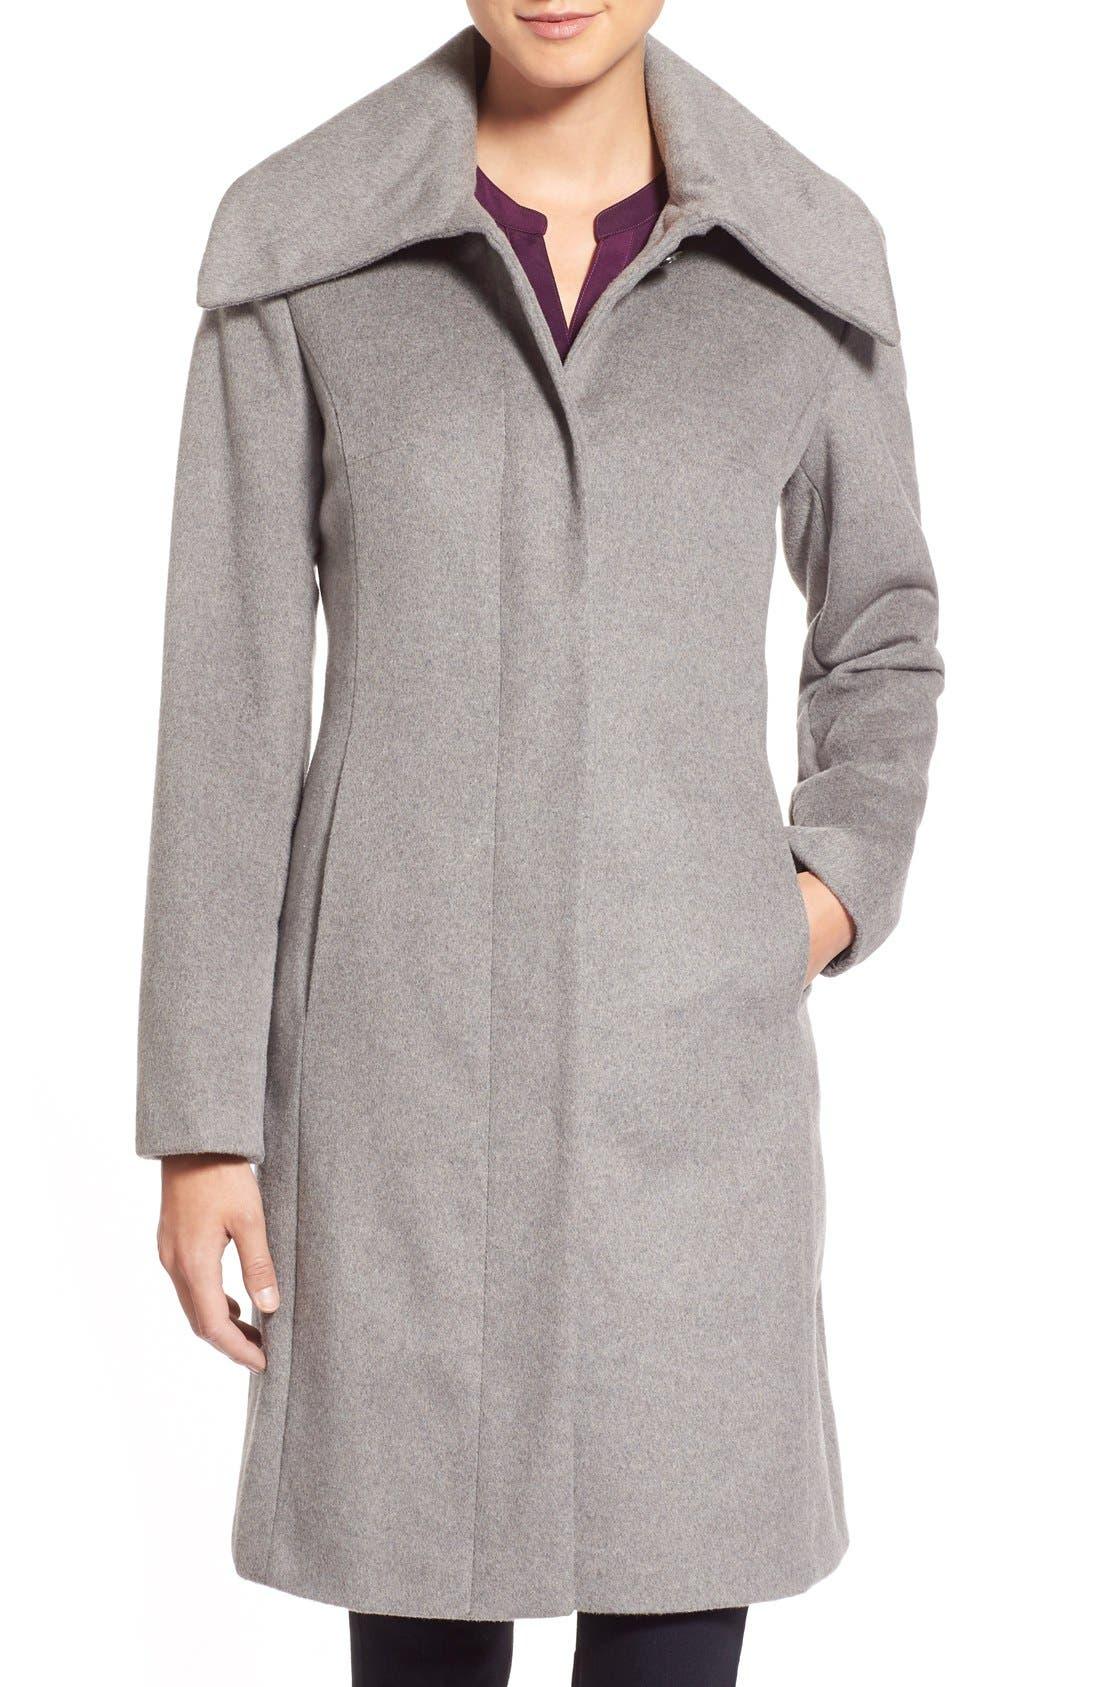 Single Breasted Wool Blend Coat,                             Main thumbnail 1, color,                             Platinum